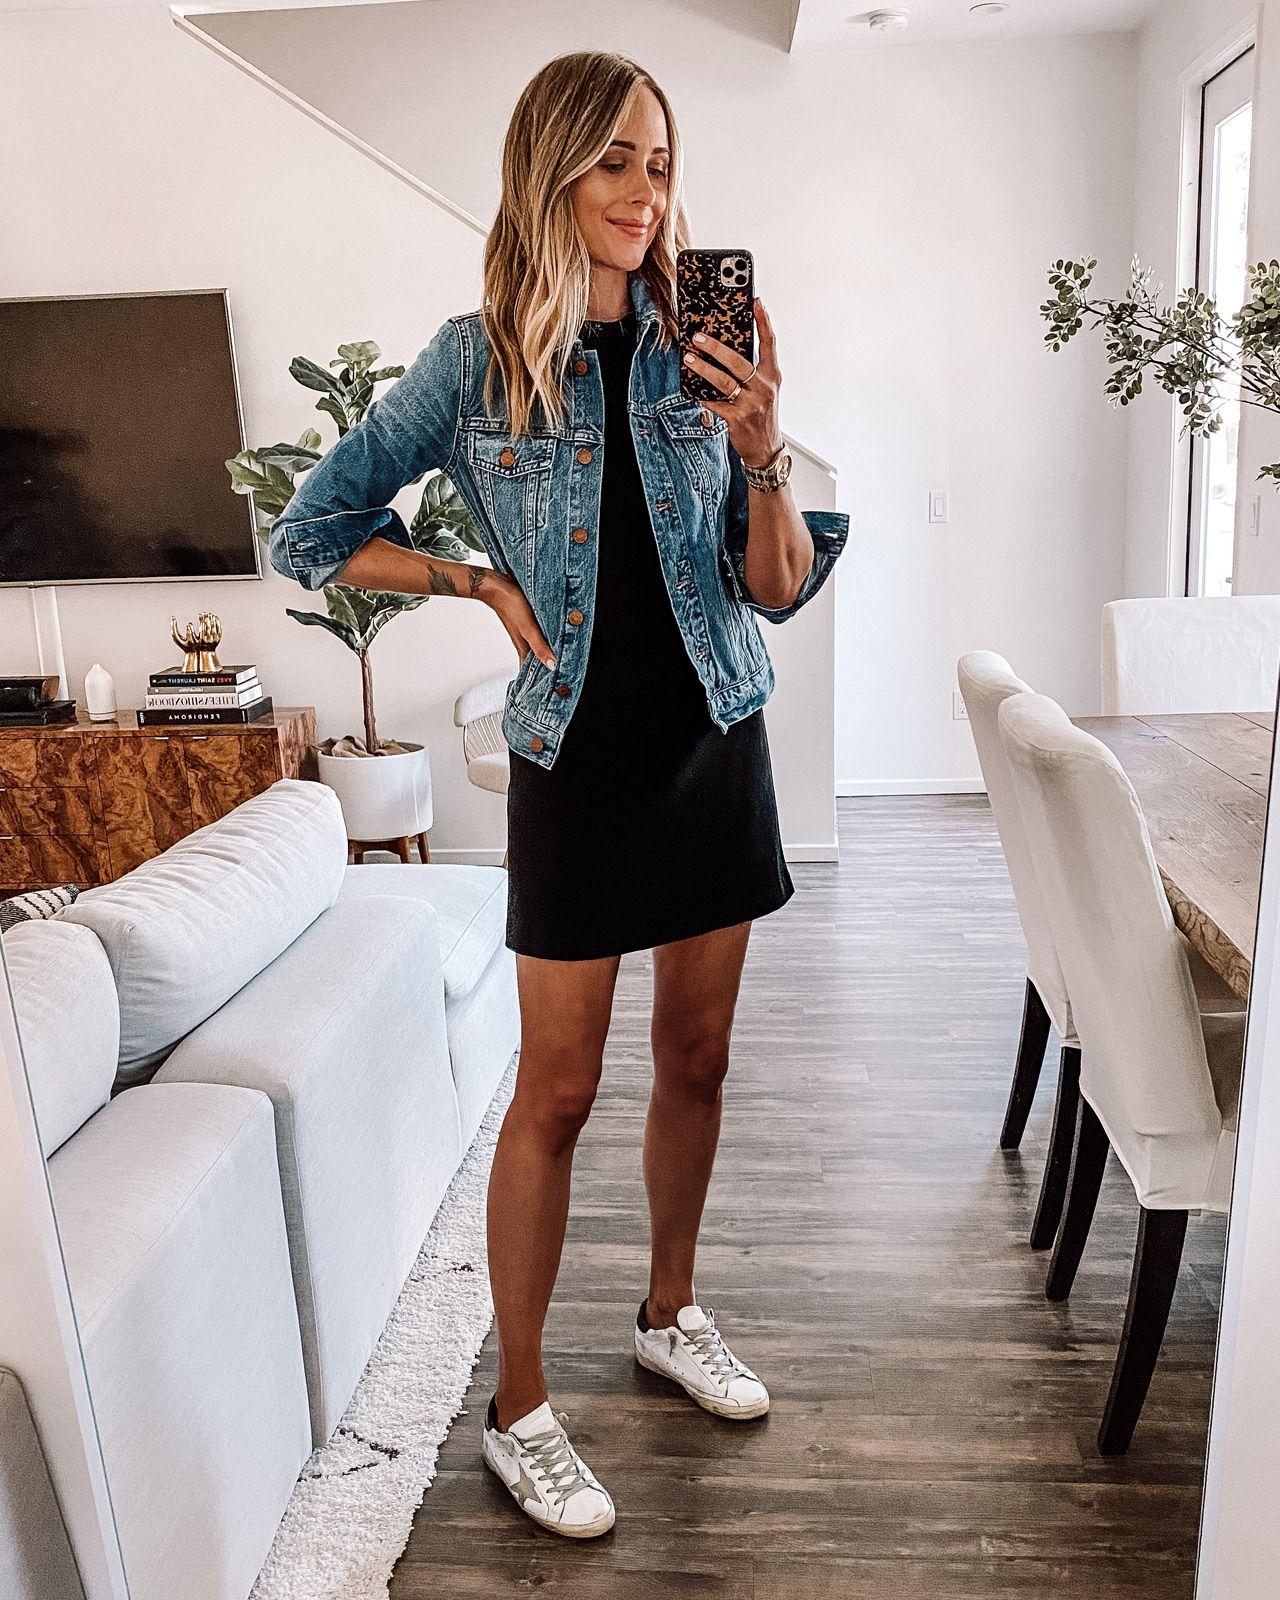 Little Black Dress Jean Jacket Outfit Denim Jacket Outfit Golden Goose Sneaker Outfit Casual Dress Outfits Black Dress Outfit Casual Fashion Jackson [ 1600 x 1280 Pixel ]